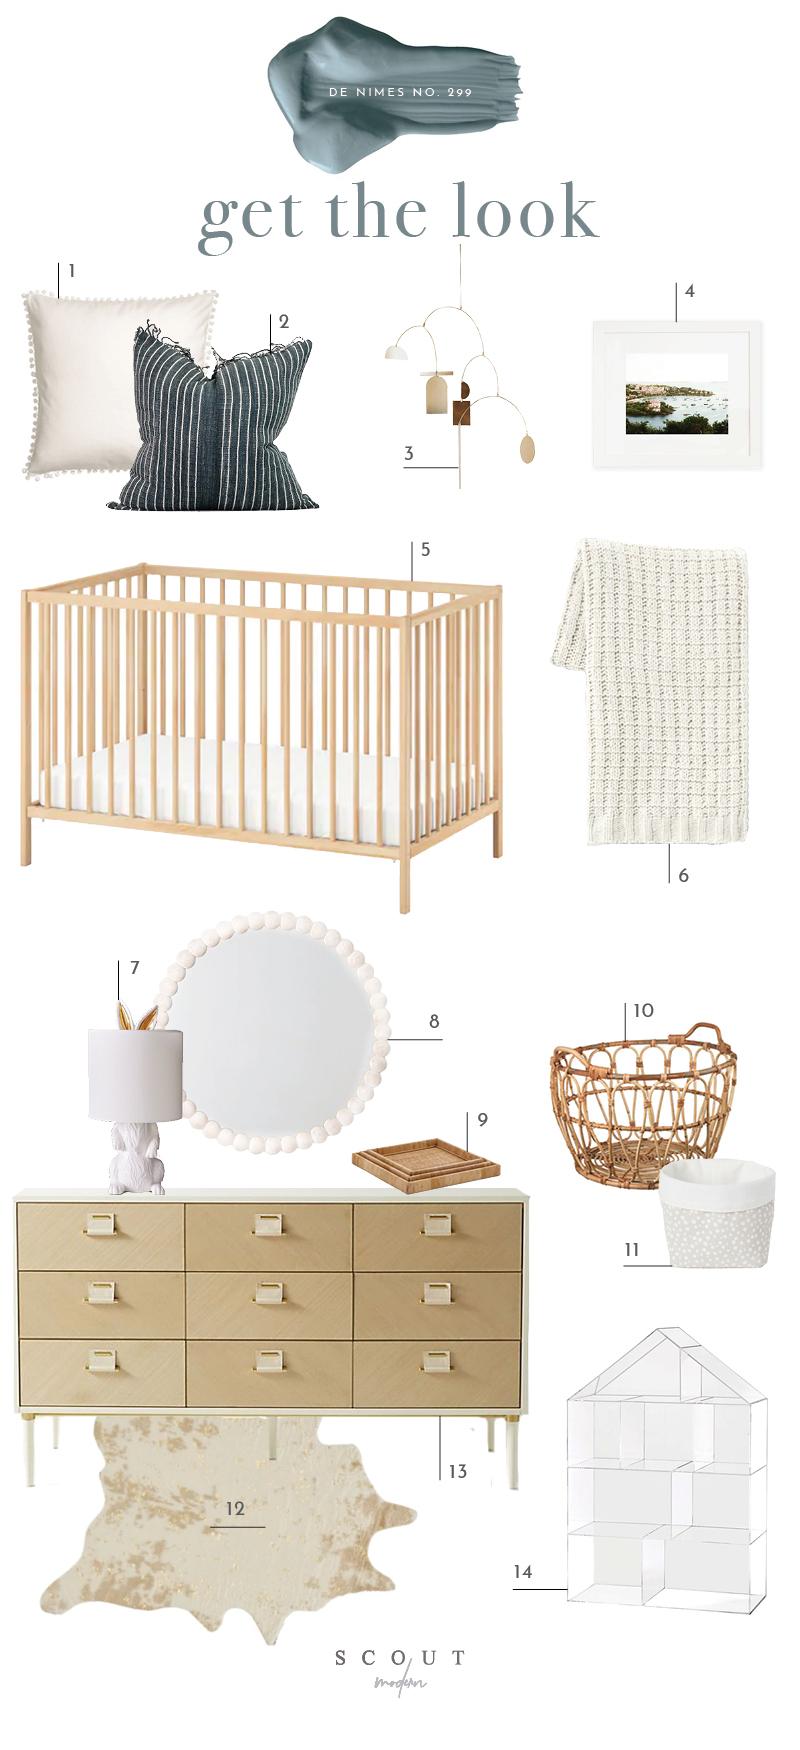 1.  Pom Pom Pillow  | 2.  Striped Pillow  | 3.  Brass Mobile  | 4.  St. John Print  | 5.  Crib  | 6.  Chenile Throw Blanket  | 7.  Rabbit Table Lamp  | 8.  Wood Ball Mirror  | 9.  Set of Woven Trays  | 10.  Basket  | 11.  Fabric Basket  | 12.  Faux Hide Rug  | 13.  Nine Drawer Dresser  | 14.  Acrylic House Book Shelf